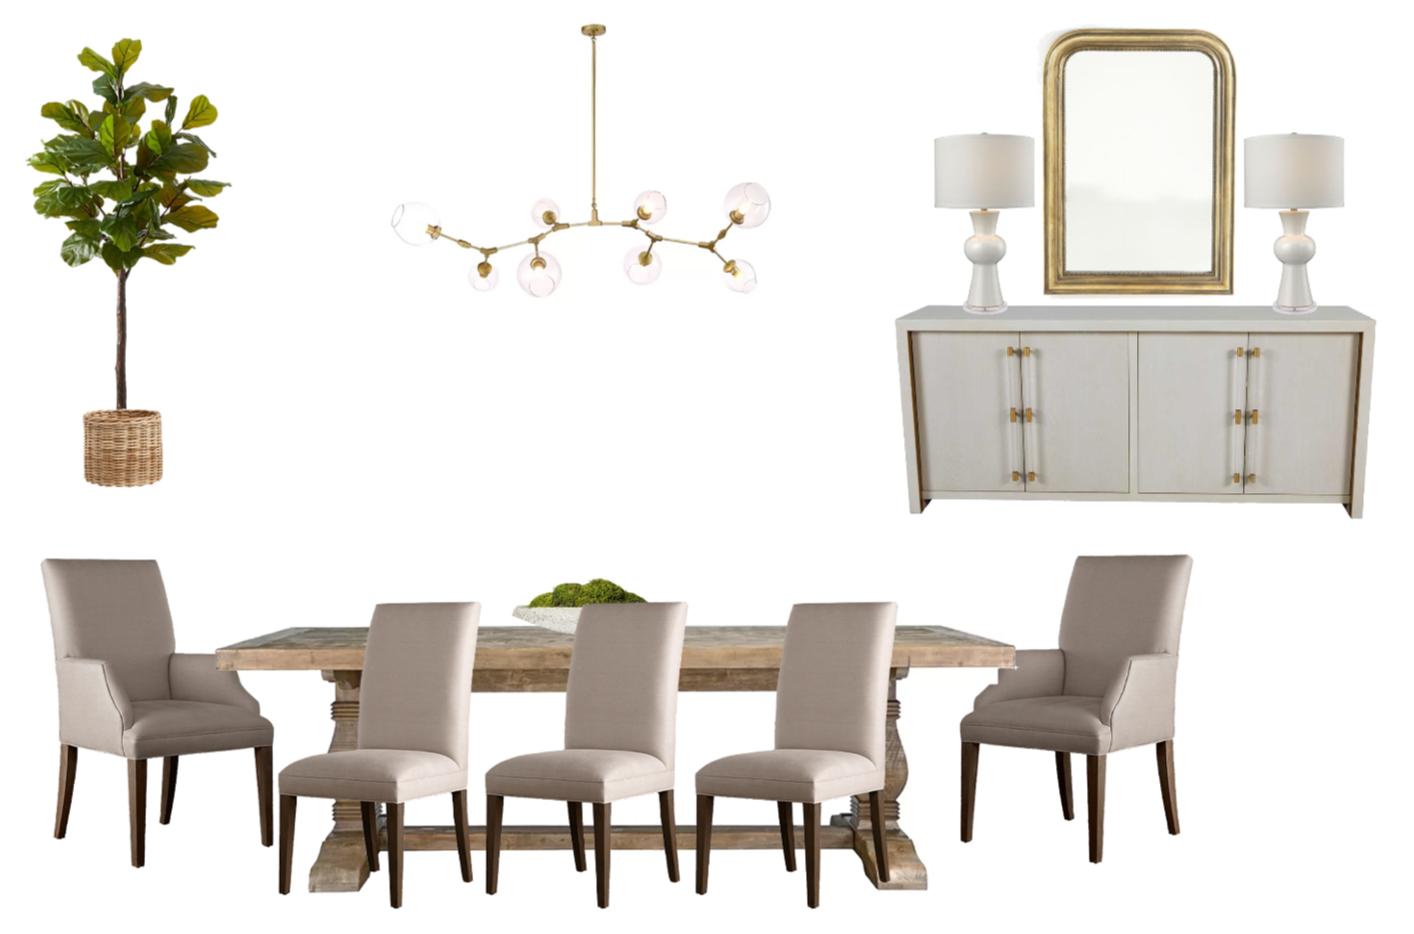 Dining Room Design Plan